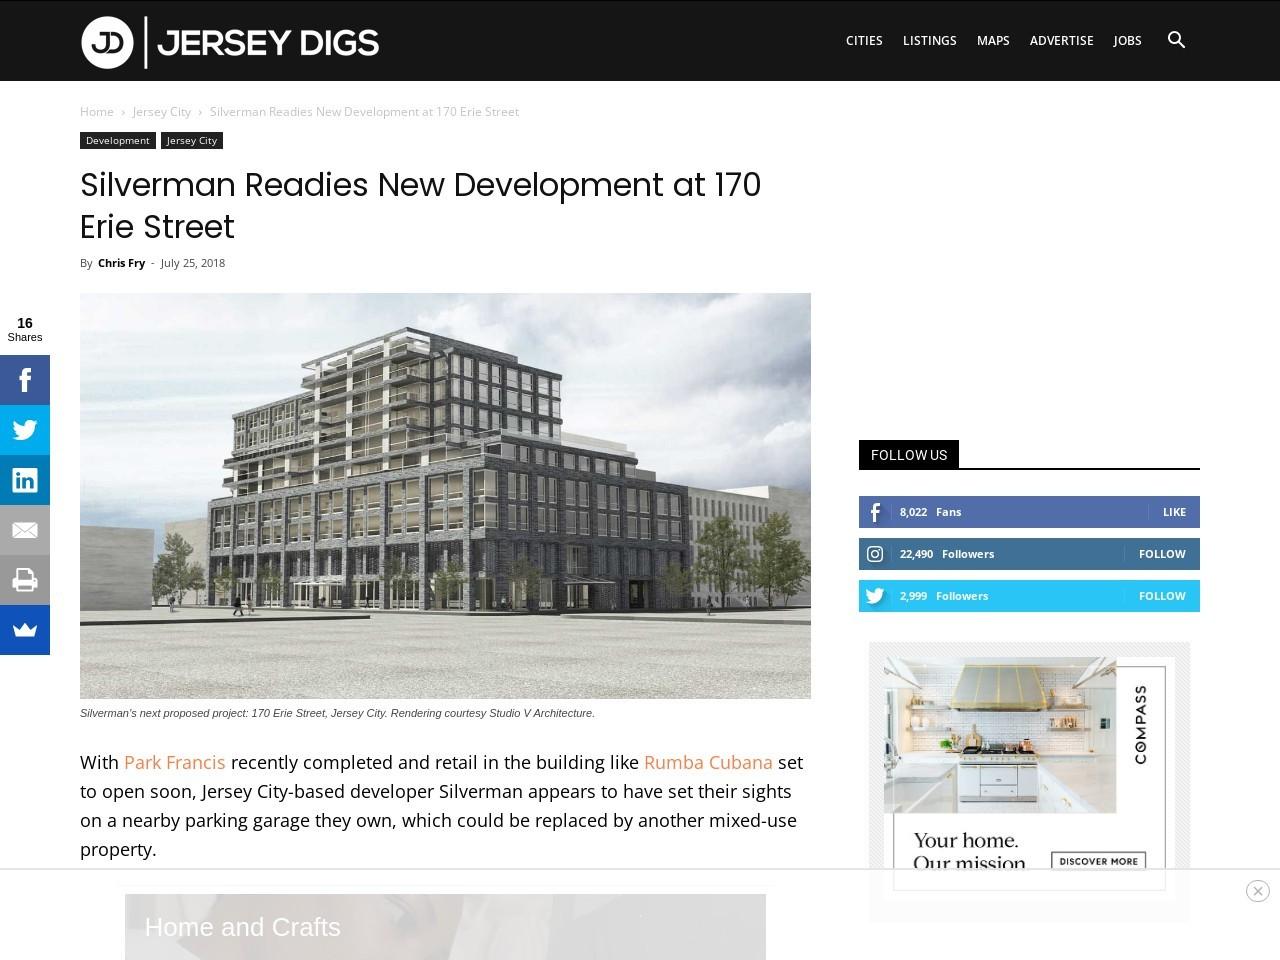 Silverman Readies New Development at 170 Erie Street